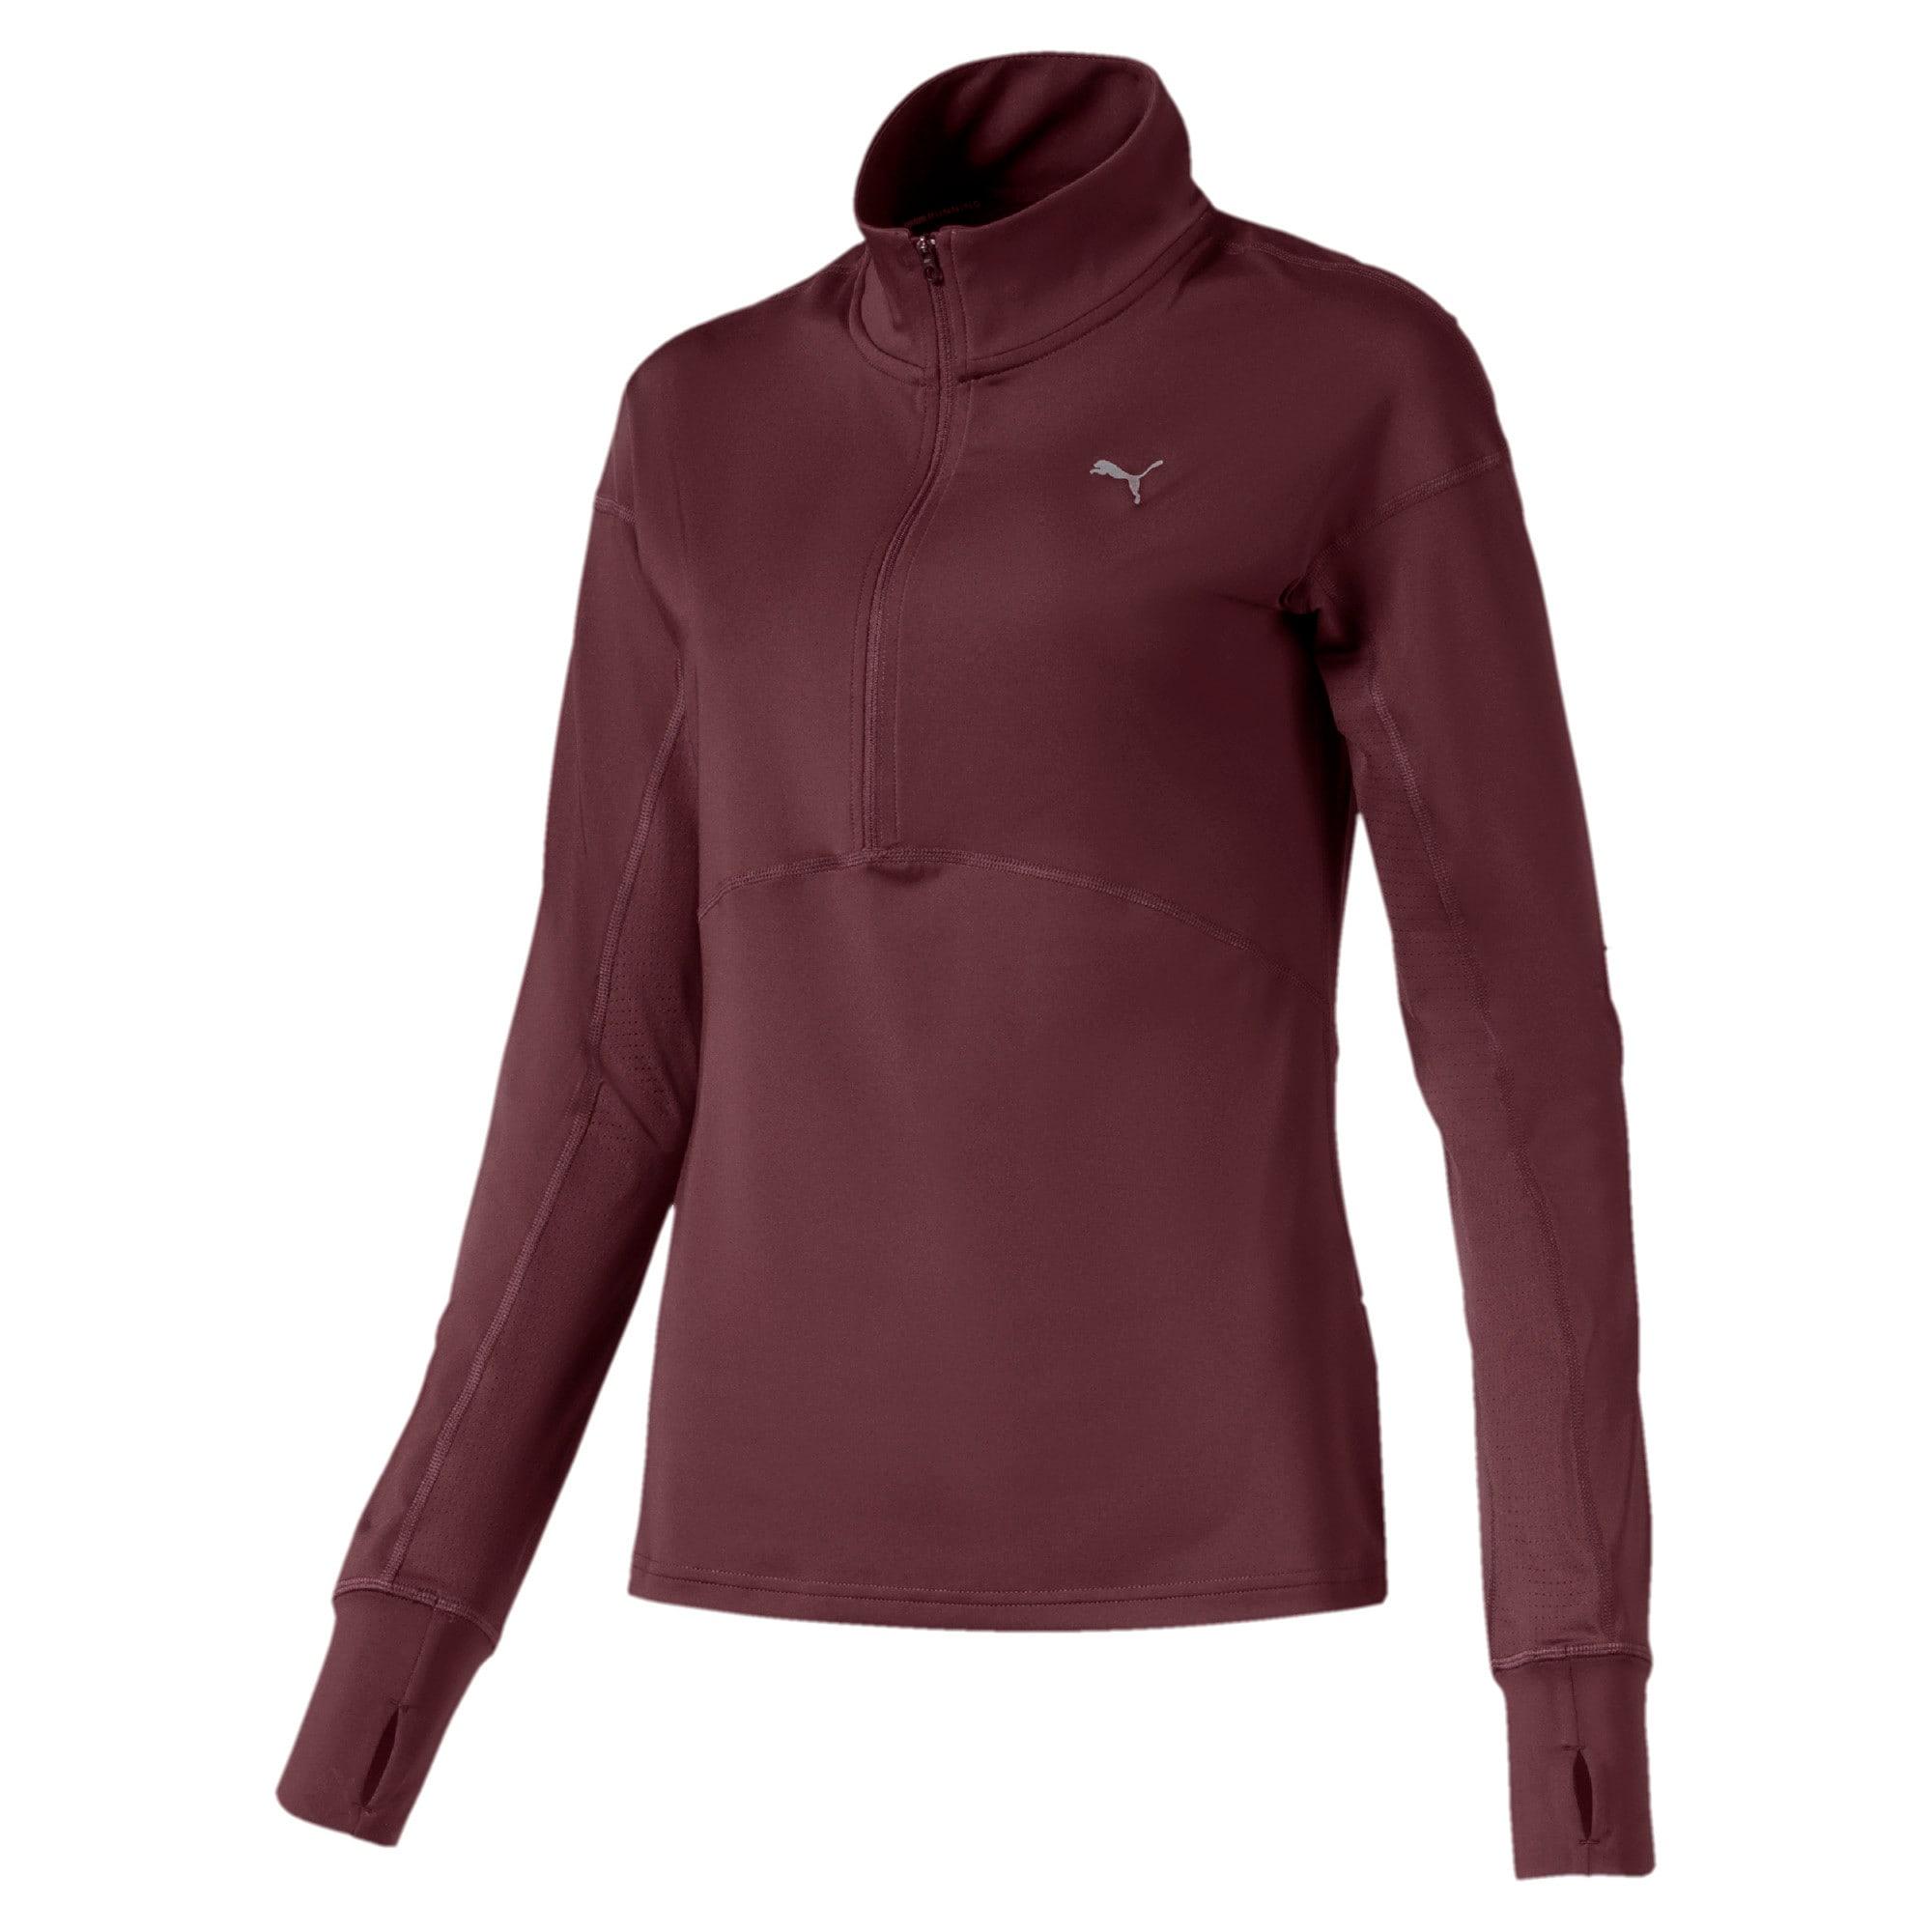 Thumbnail 4 of ADHM 2019 IGNITE Long Sleeve Women's Running Pullover, Vineyard Wine, medium-IND